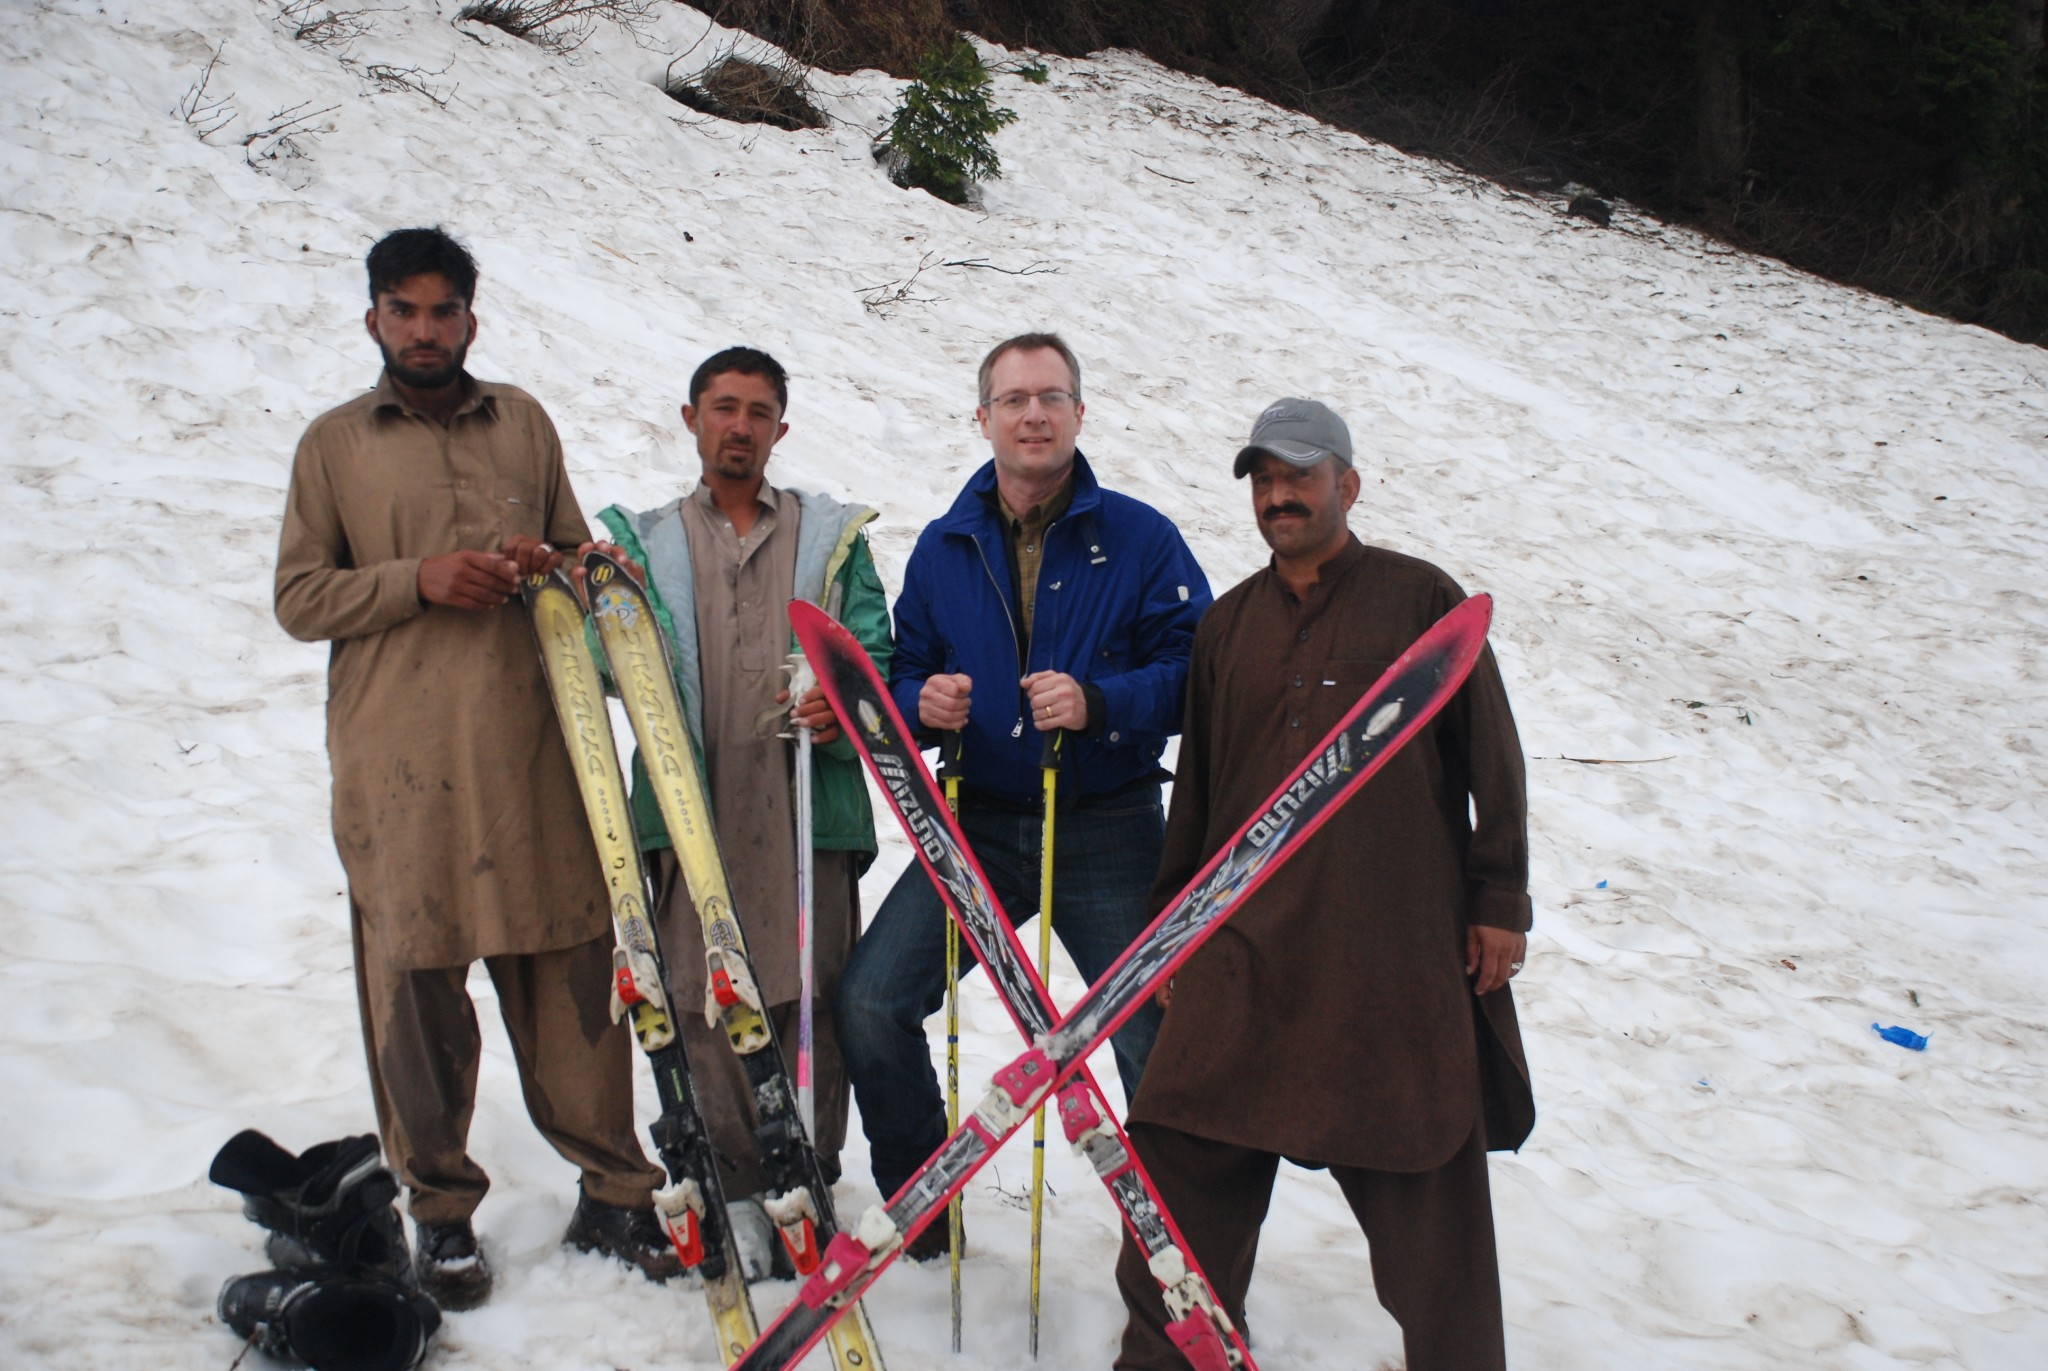 Skiing Pakistan Inthesnow